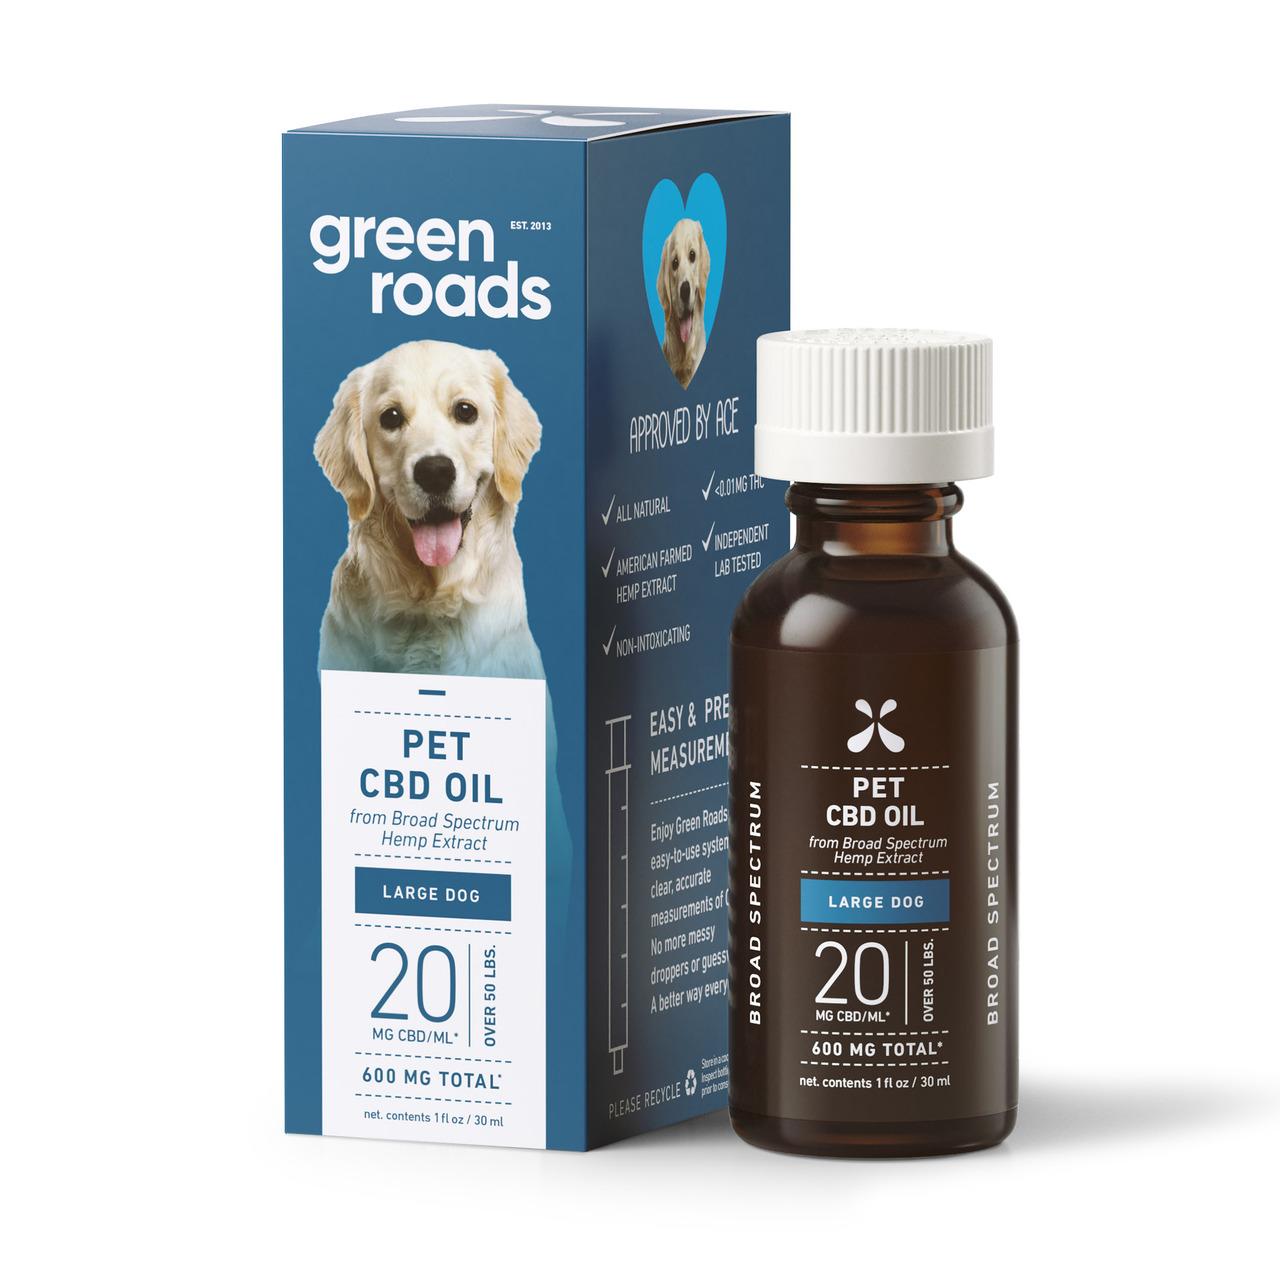 Green Roads, Pet CBD Drops Large Dog, Broad Spectrum, 1oz, 20MG:ML, 600mg of CBD 1